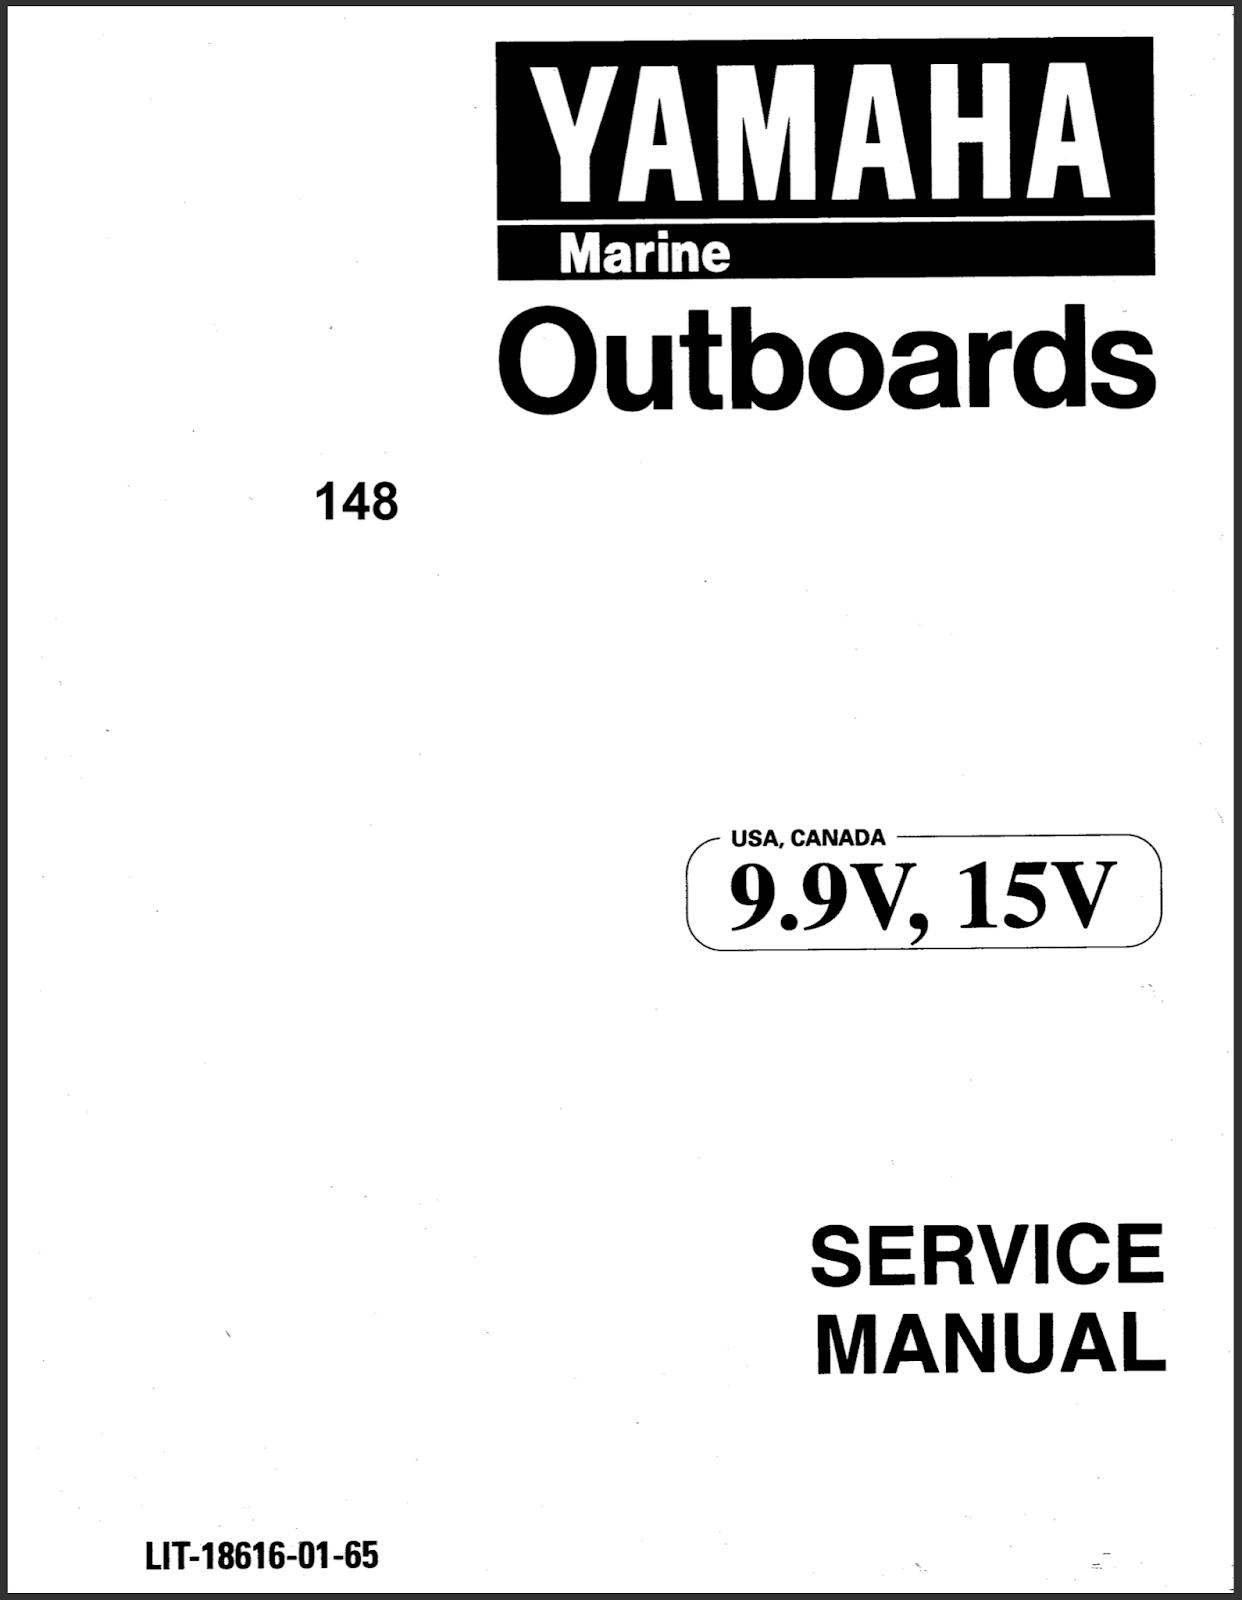 Yamaha Outboard Service Manual